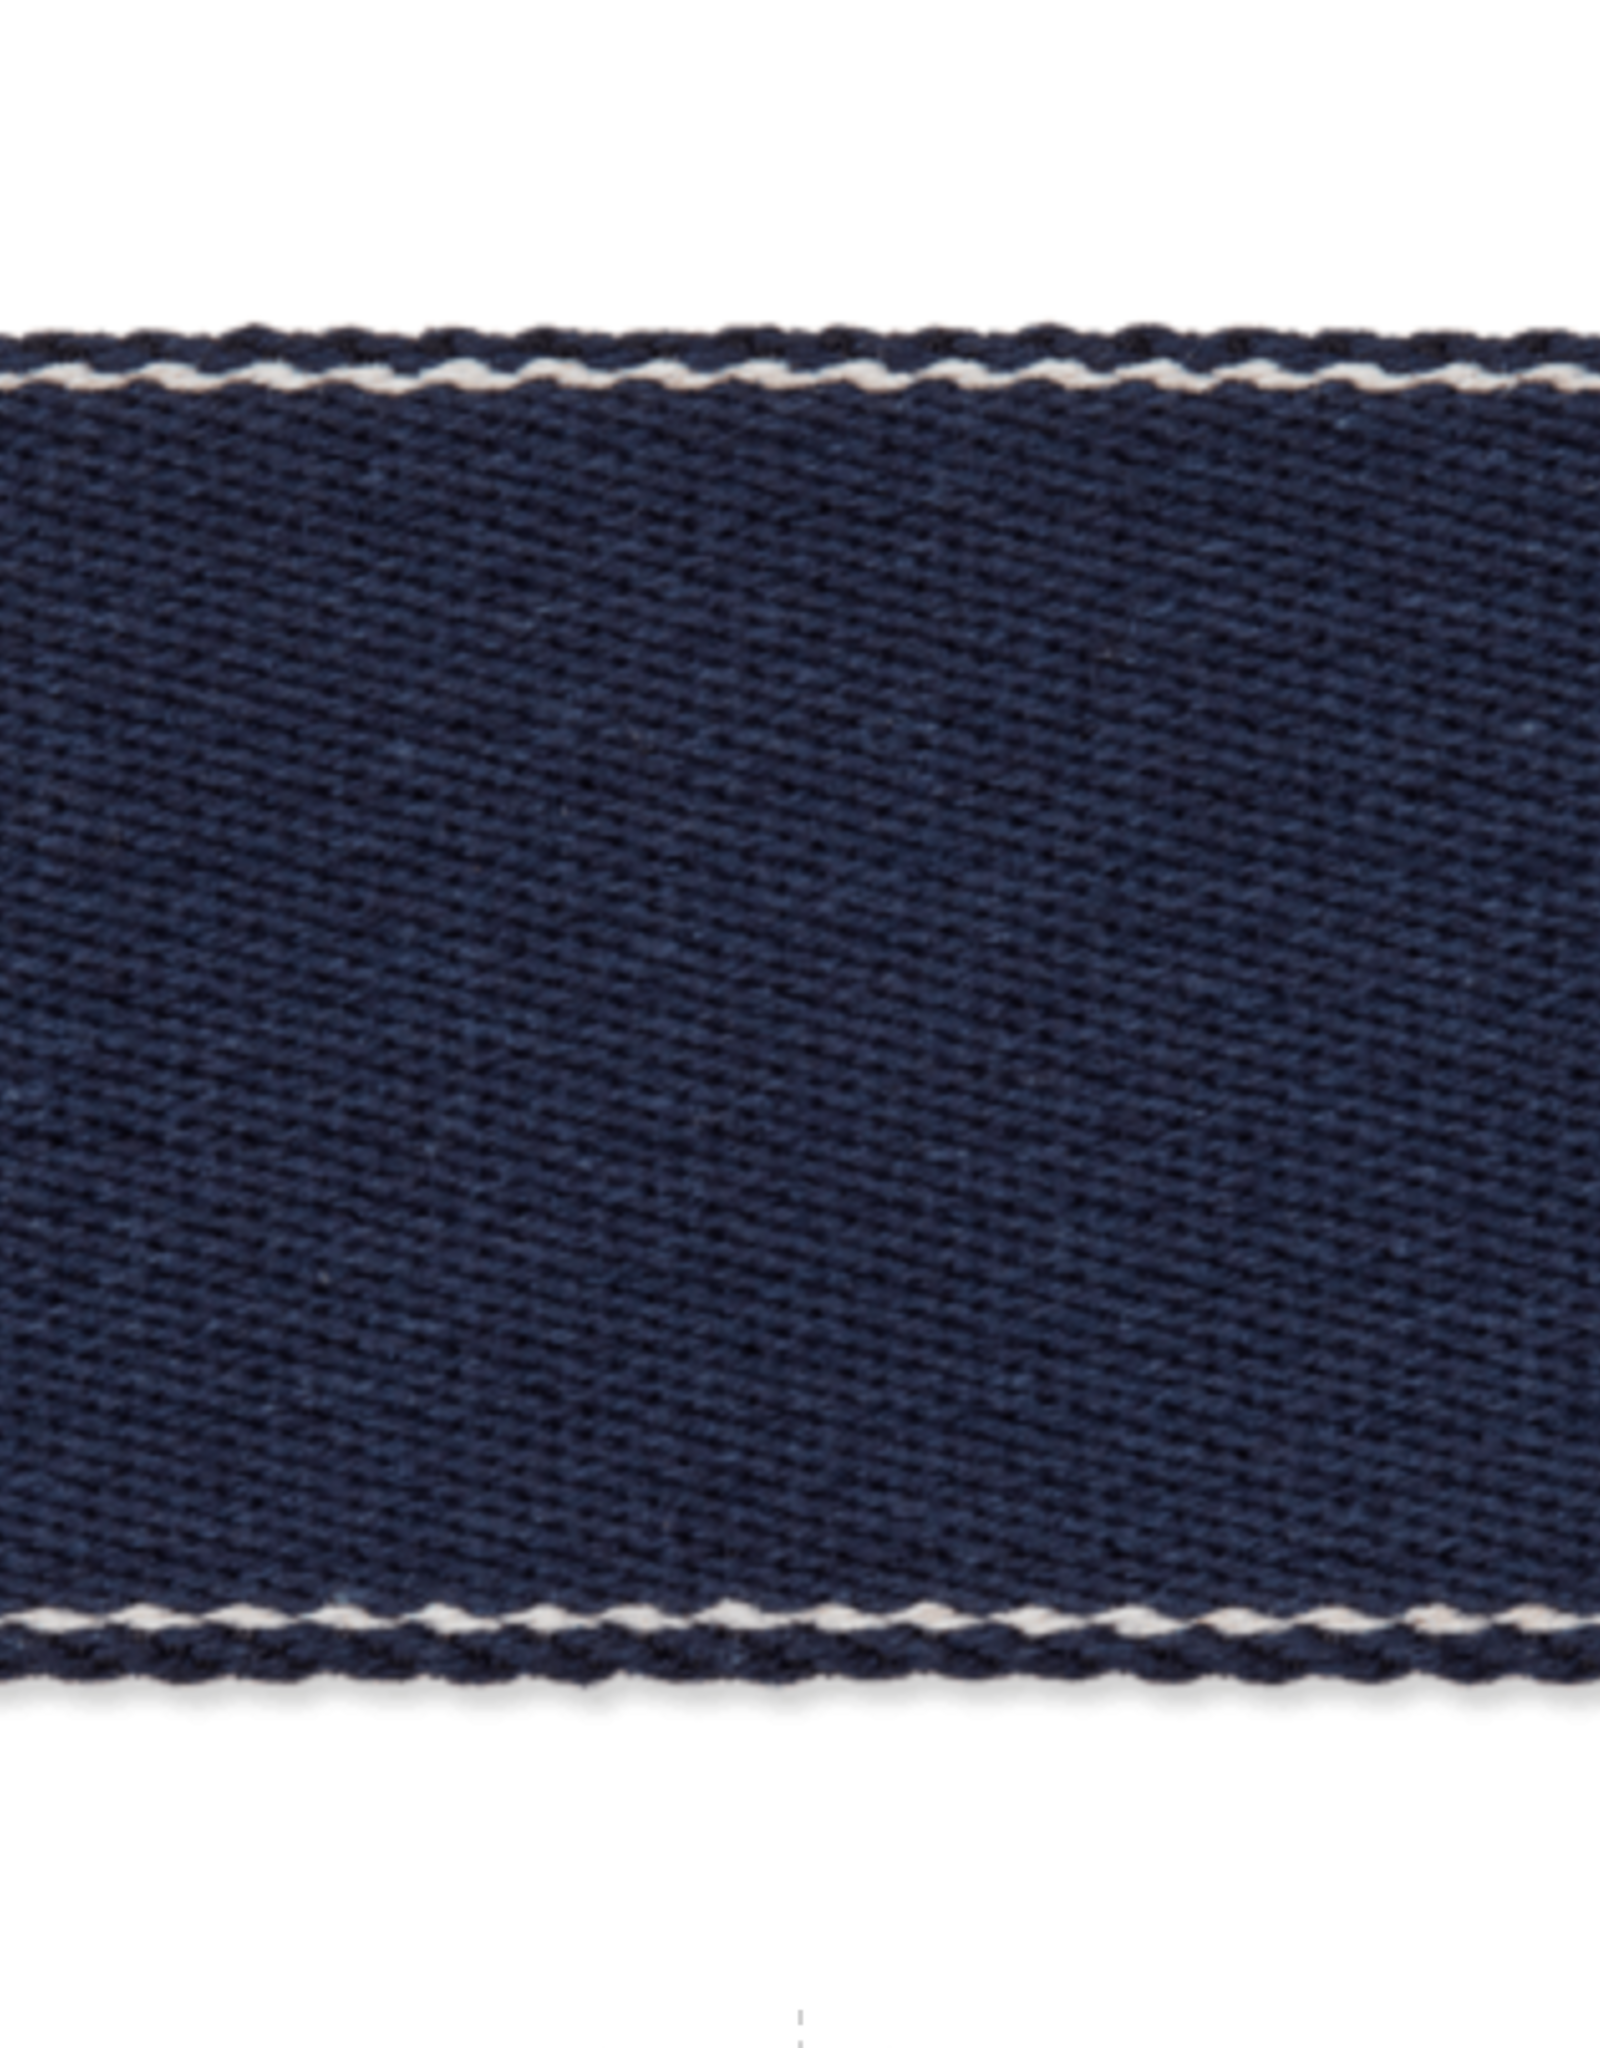 Tassenband - Blauw Soft - 40mm